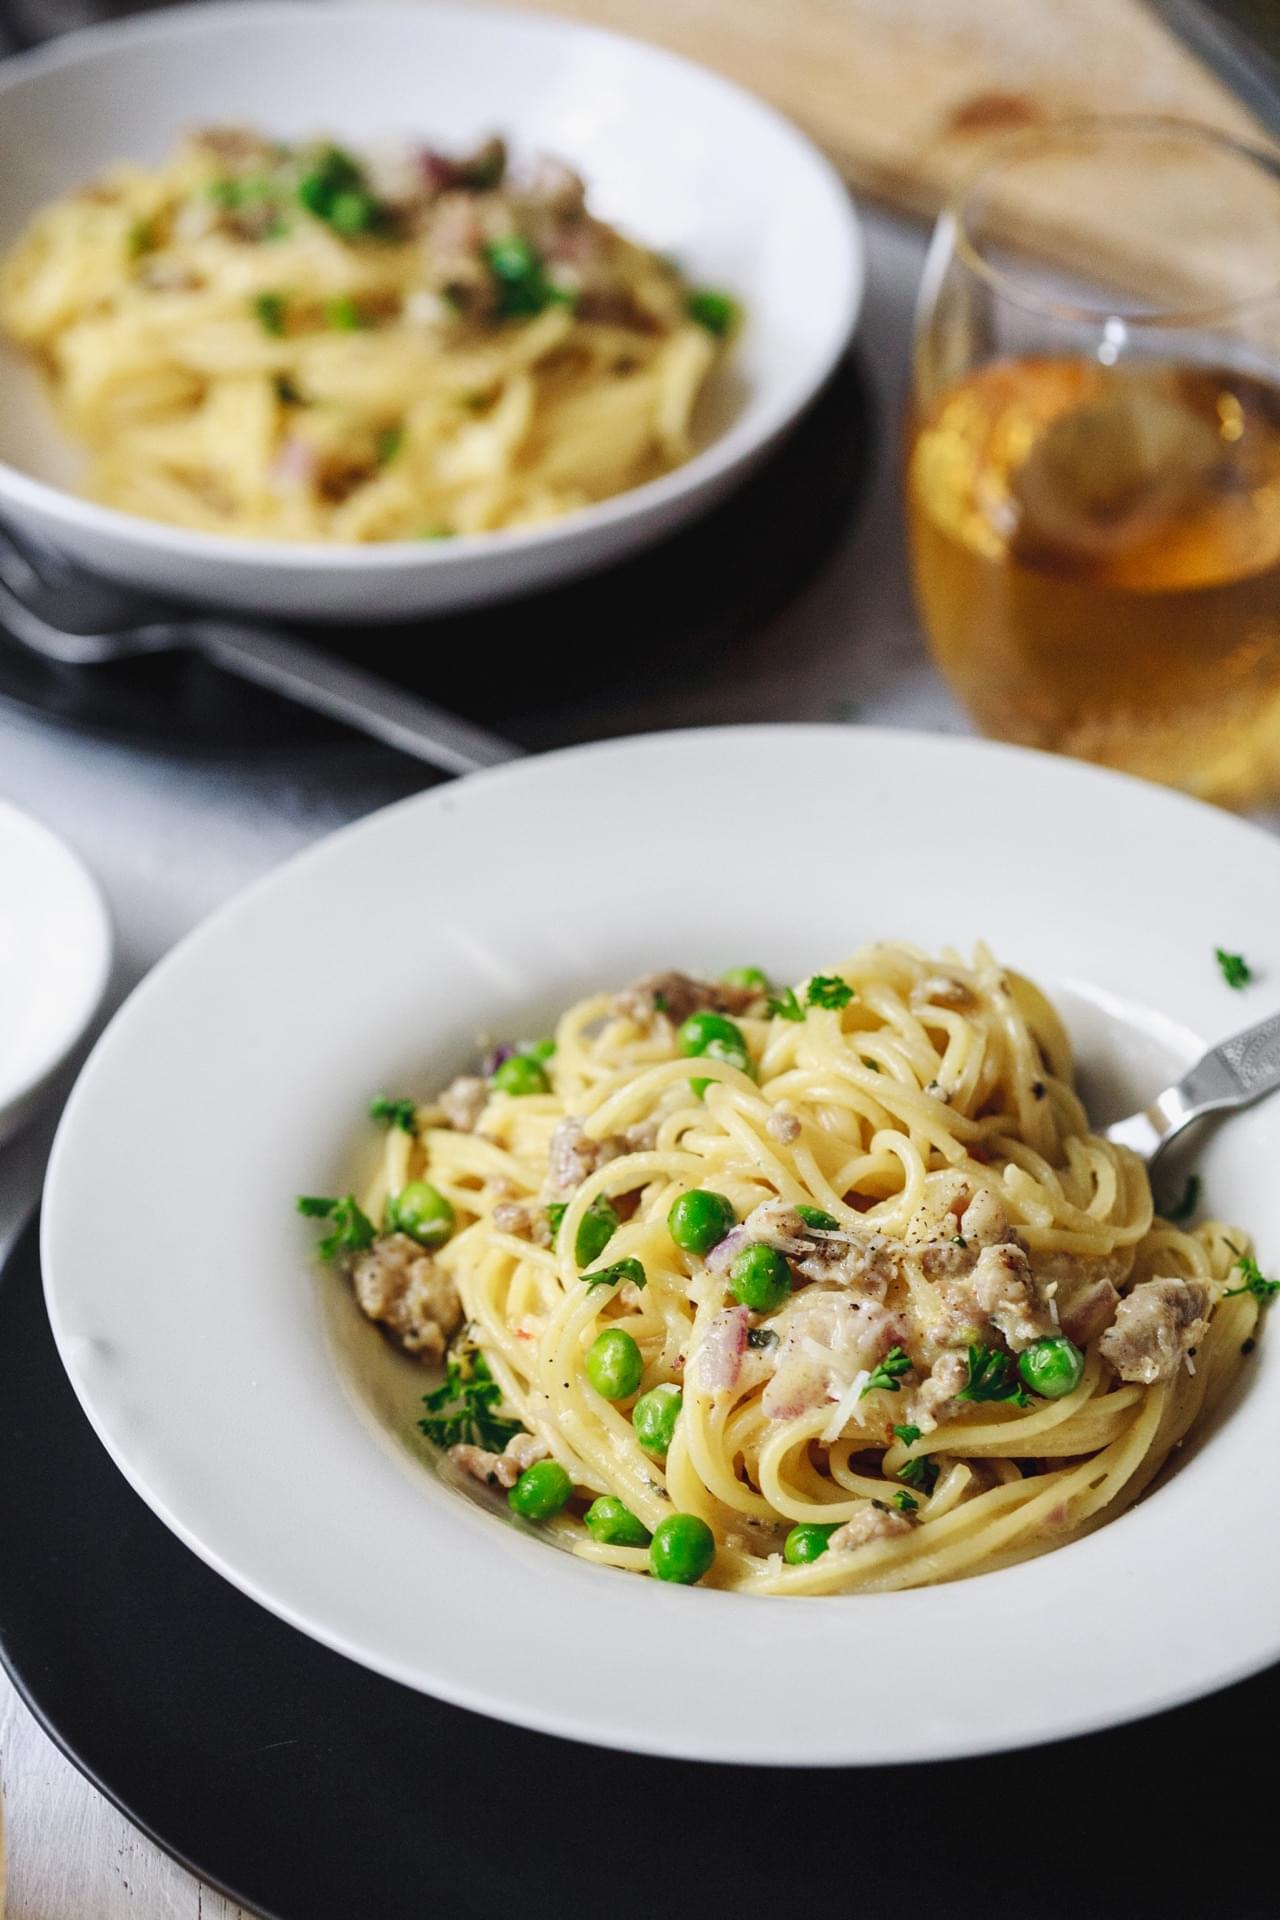 Sausage and peas spaghetti alla carbonara